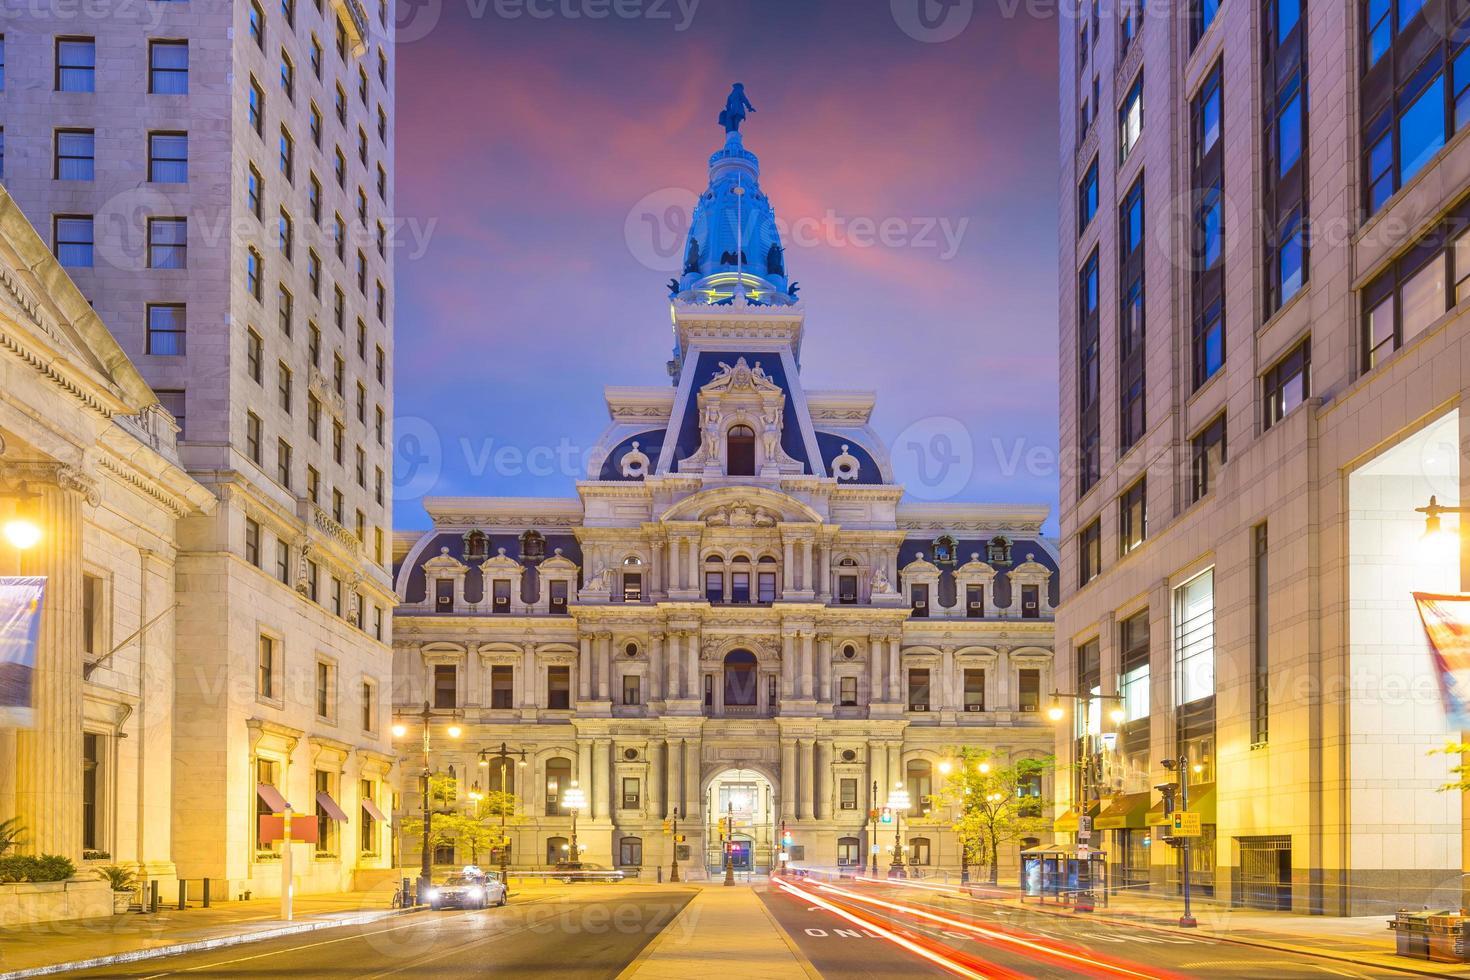 Philadelphia historisch stadhuis gebouw in de schemering foto